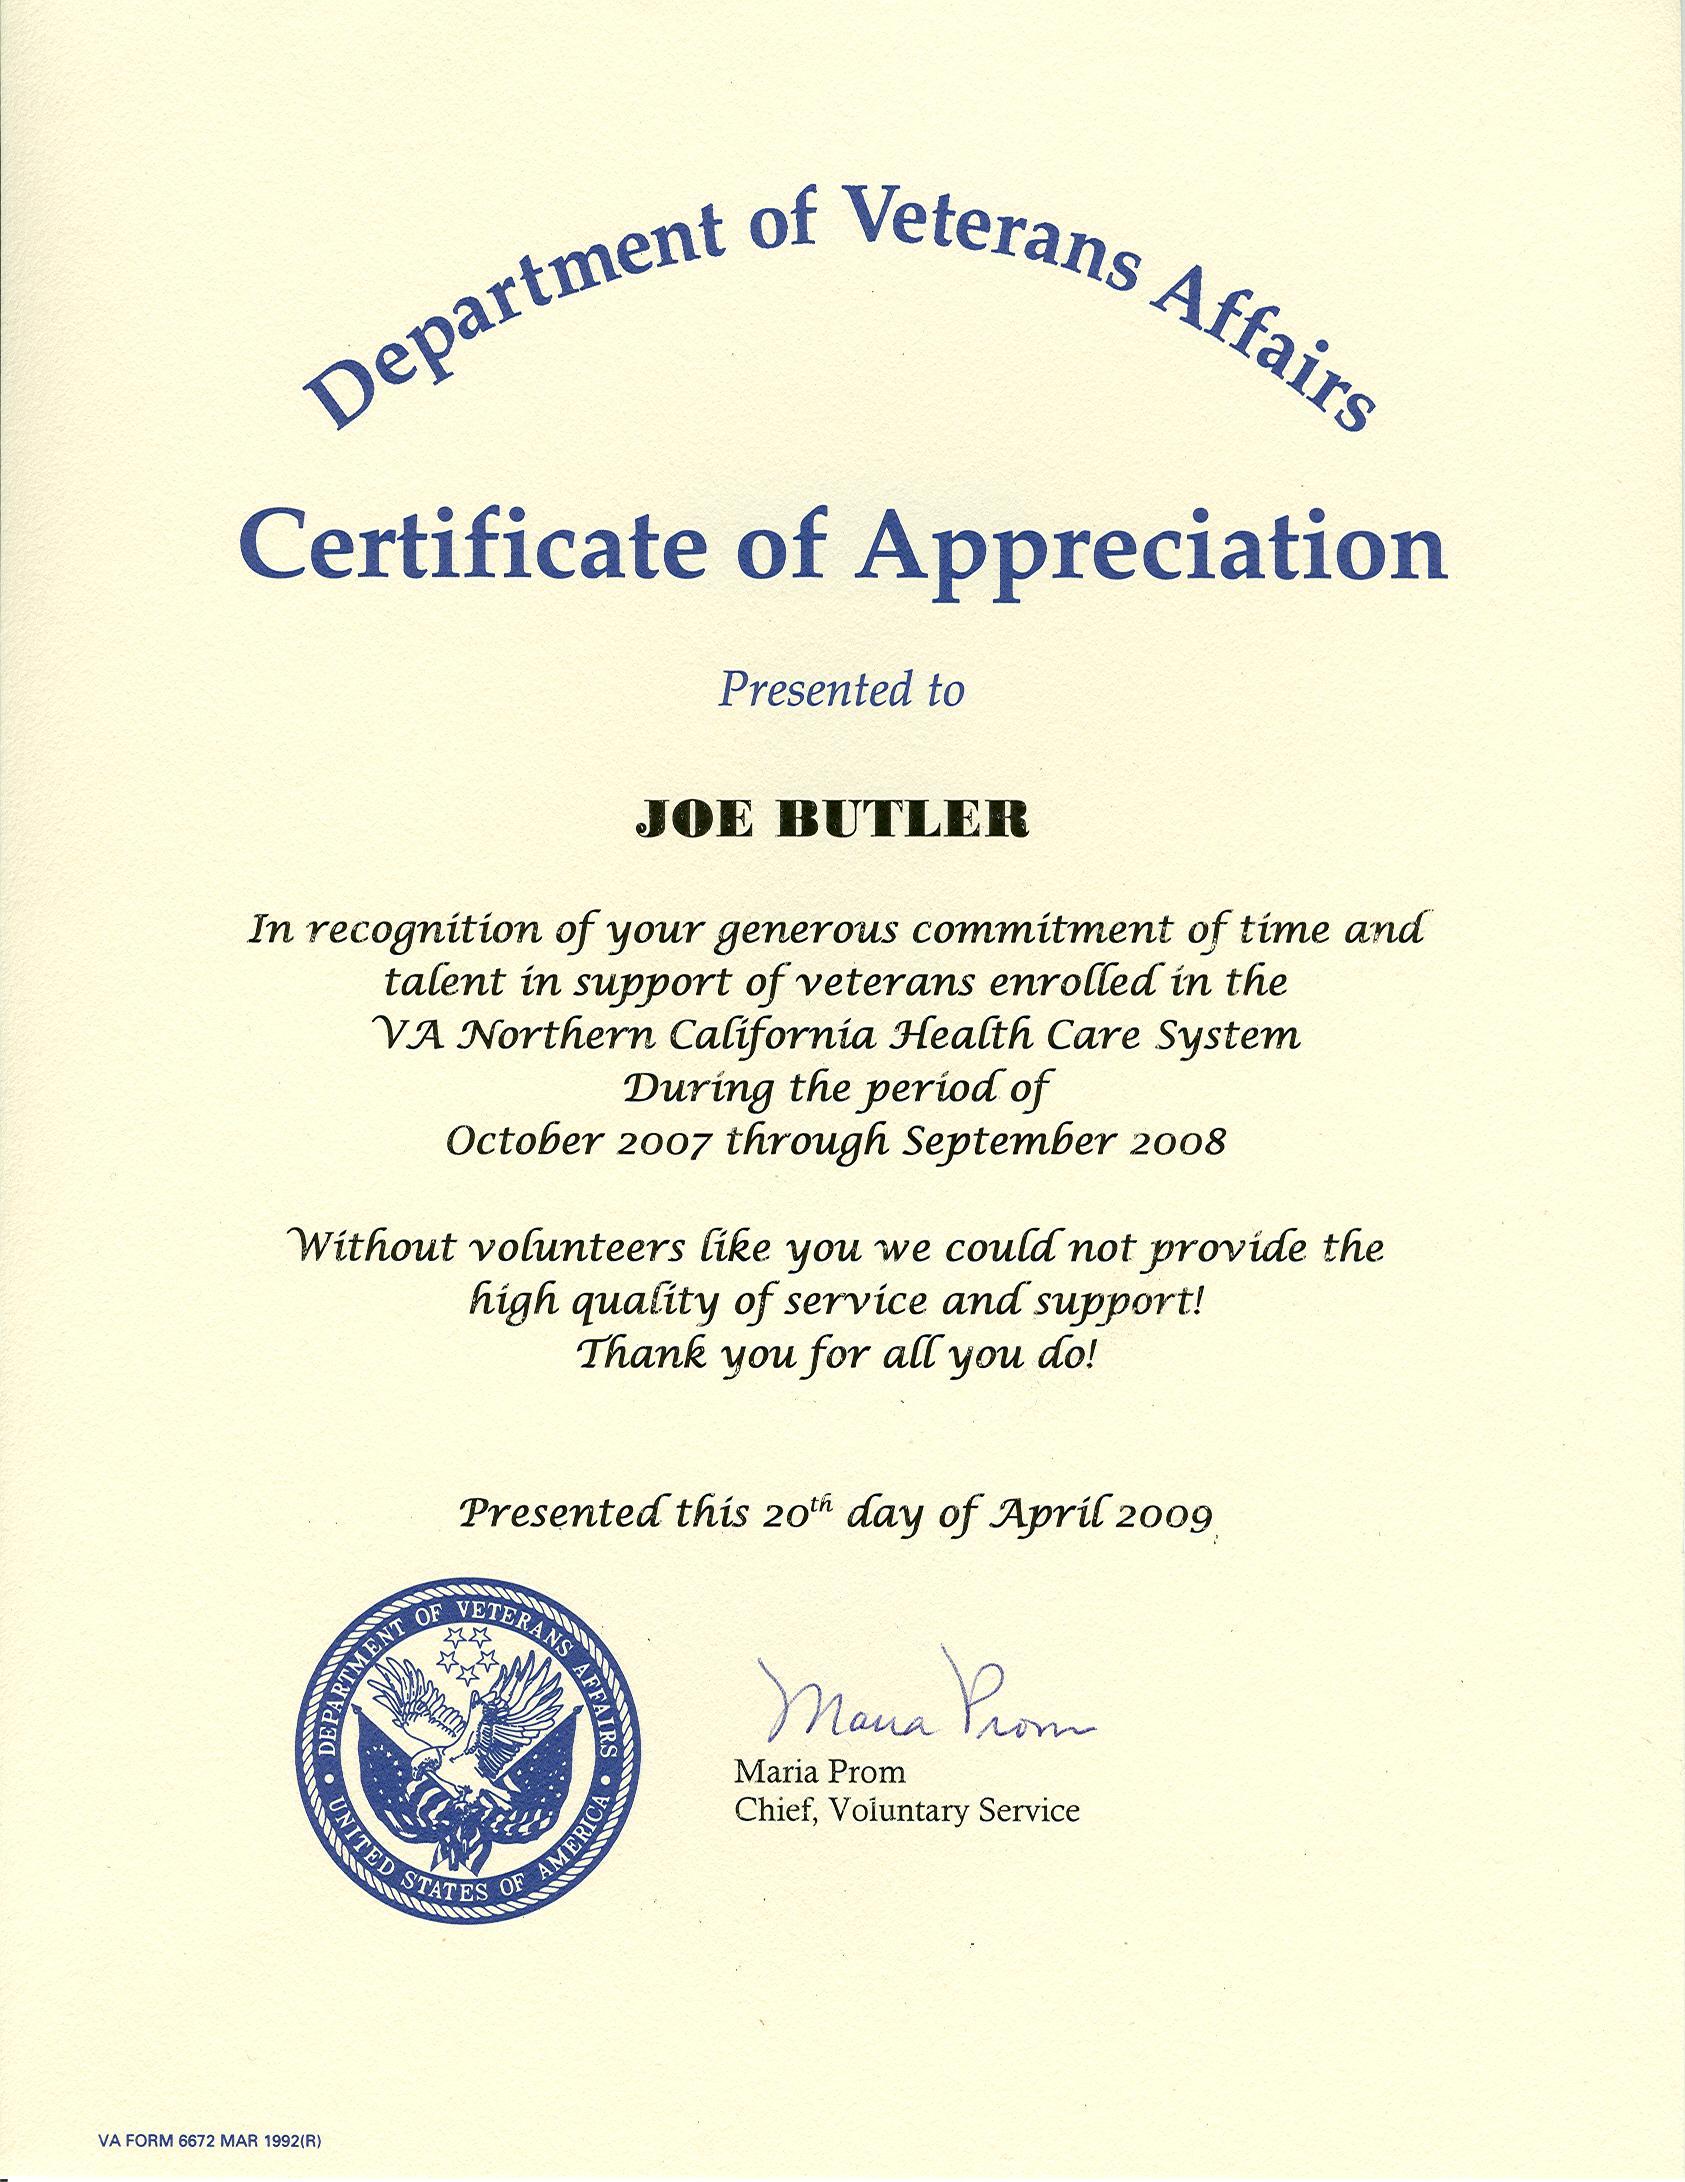 Dr joseph butler for Veterans certificate of appreciation